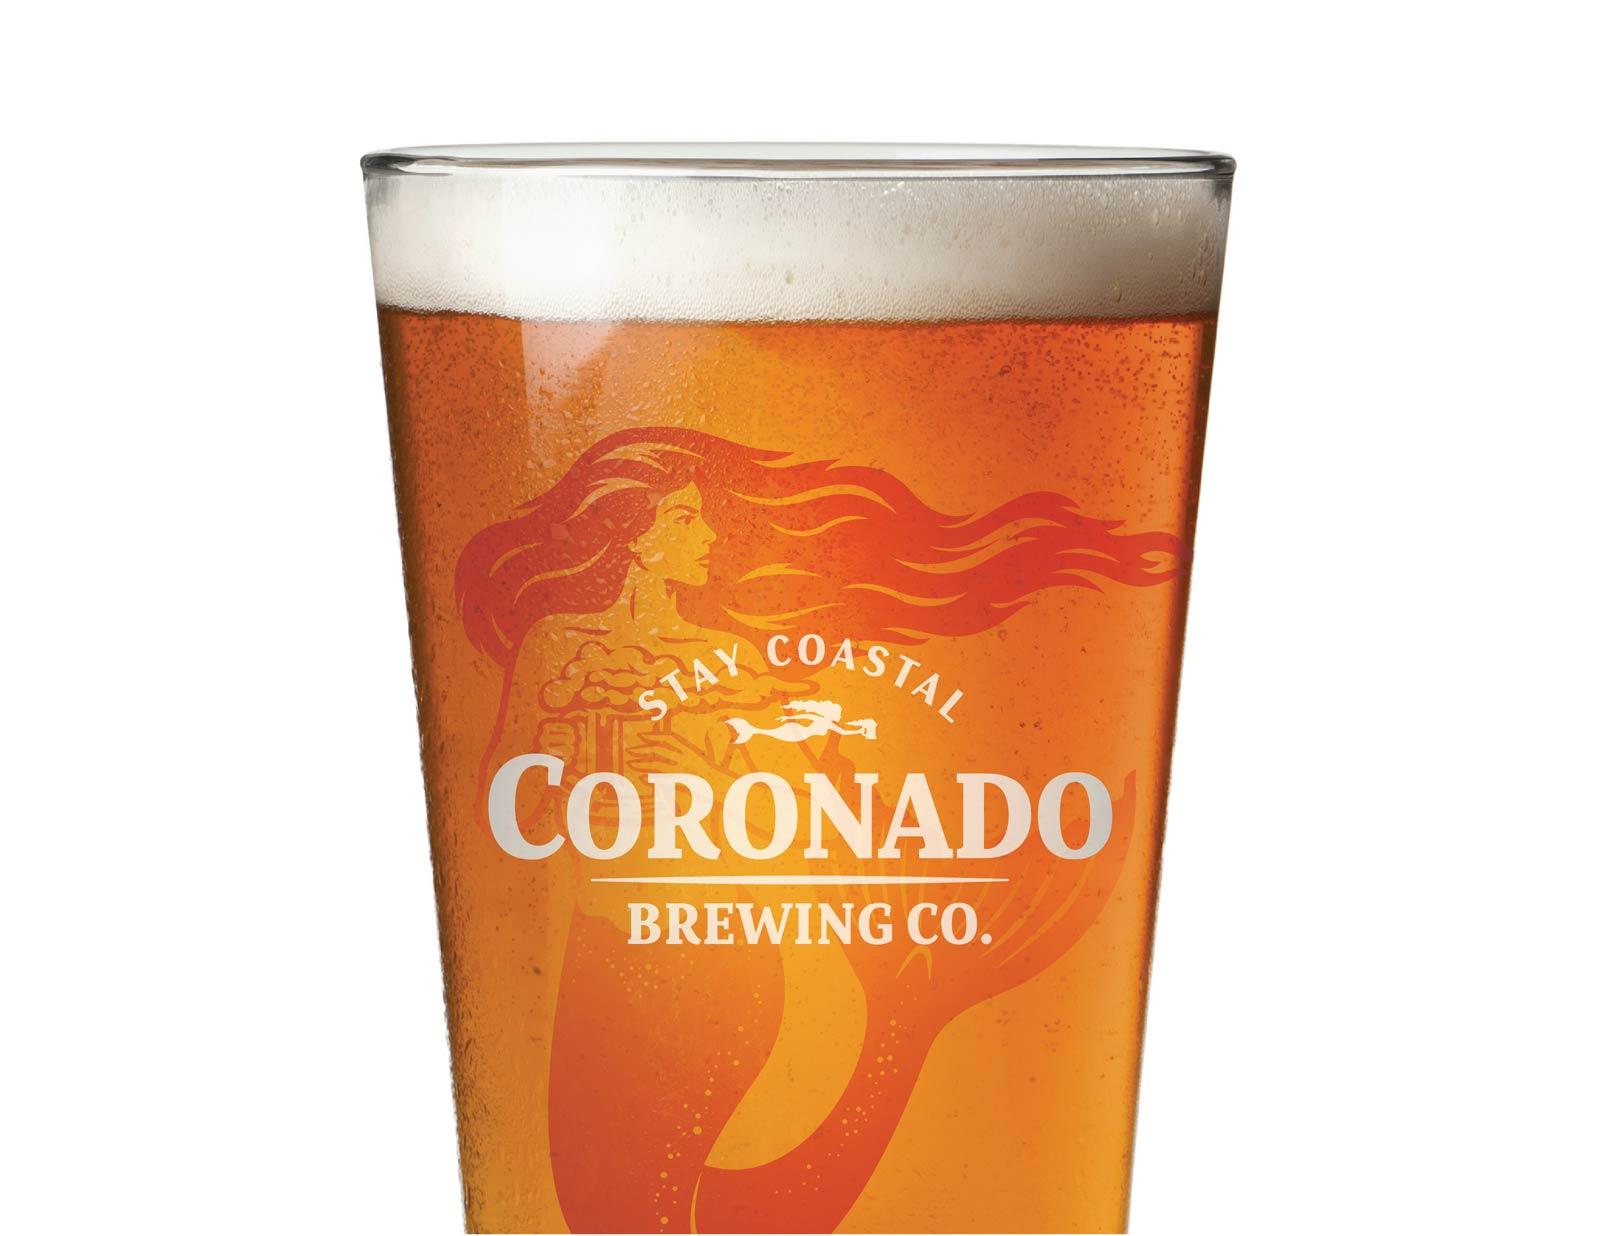 Beer & Branding: Coronado Brewing